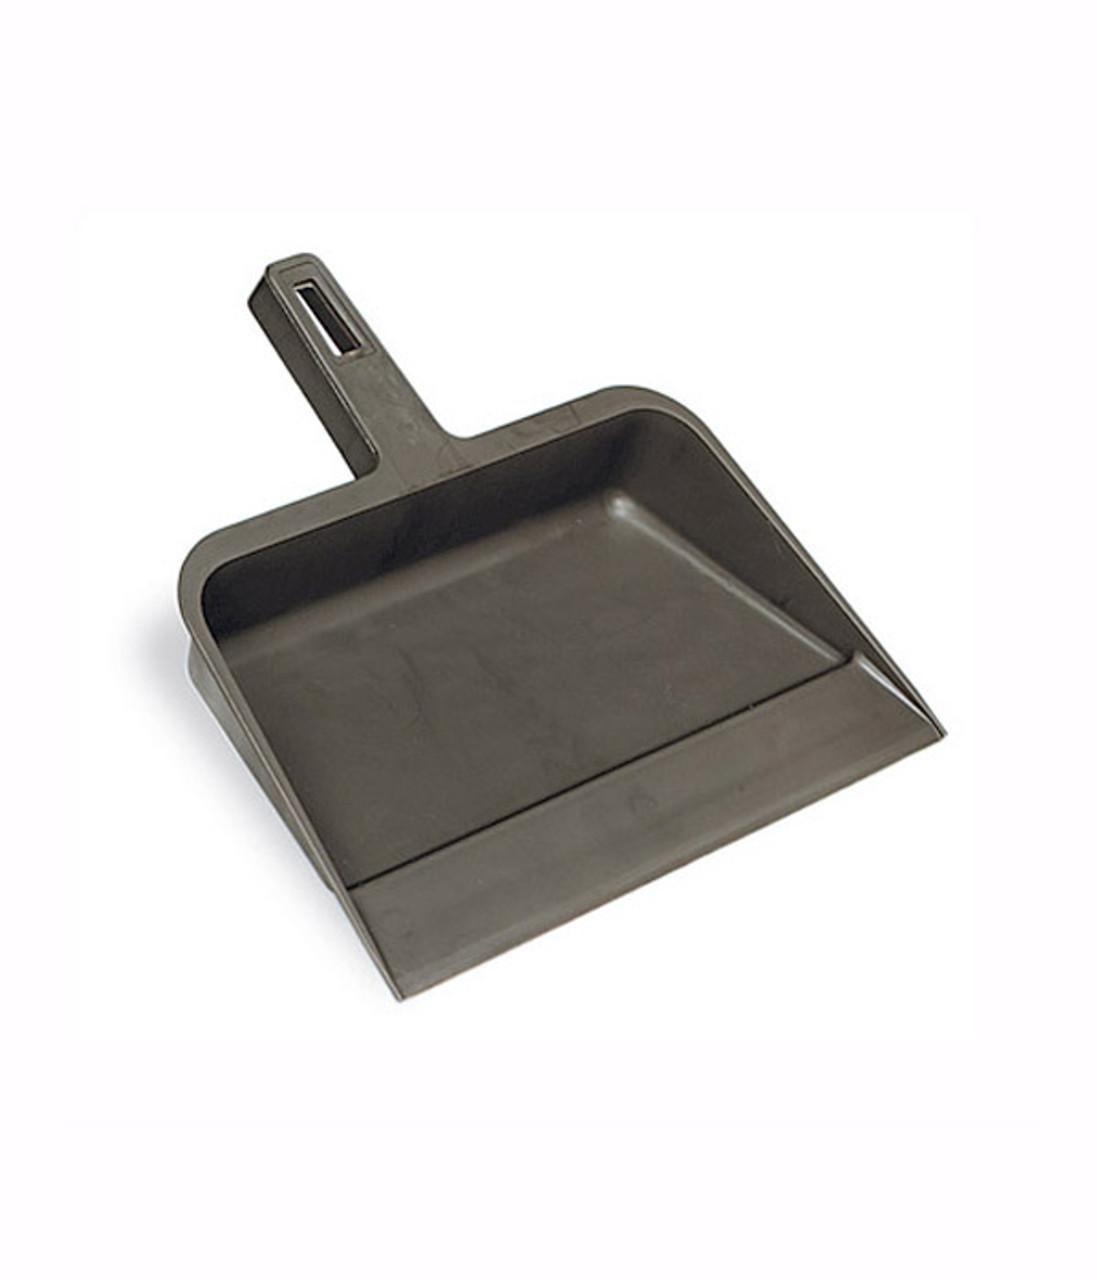 Rugged plastic saves money vs metal dust pans.